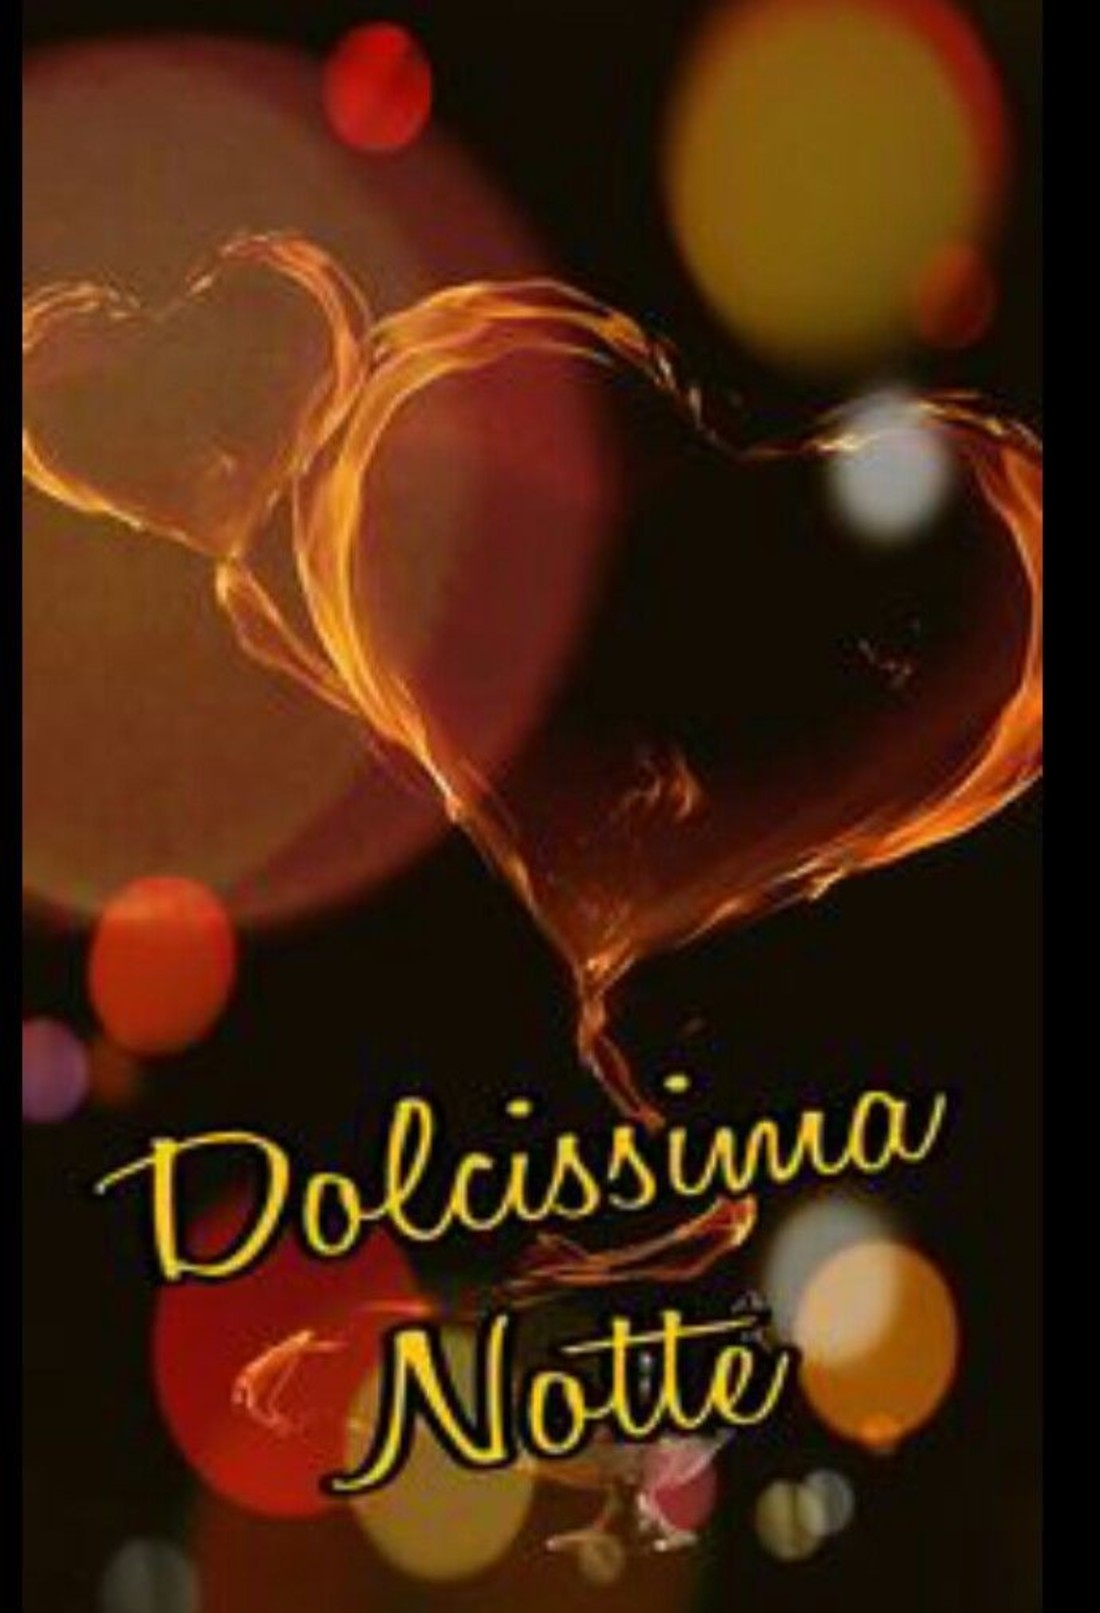 Dolcissima Notte